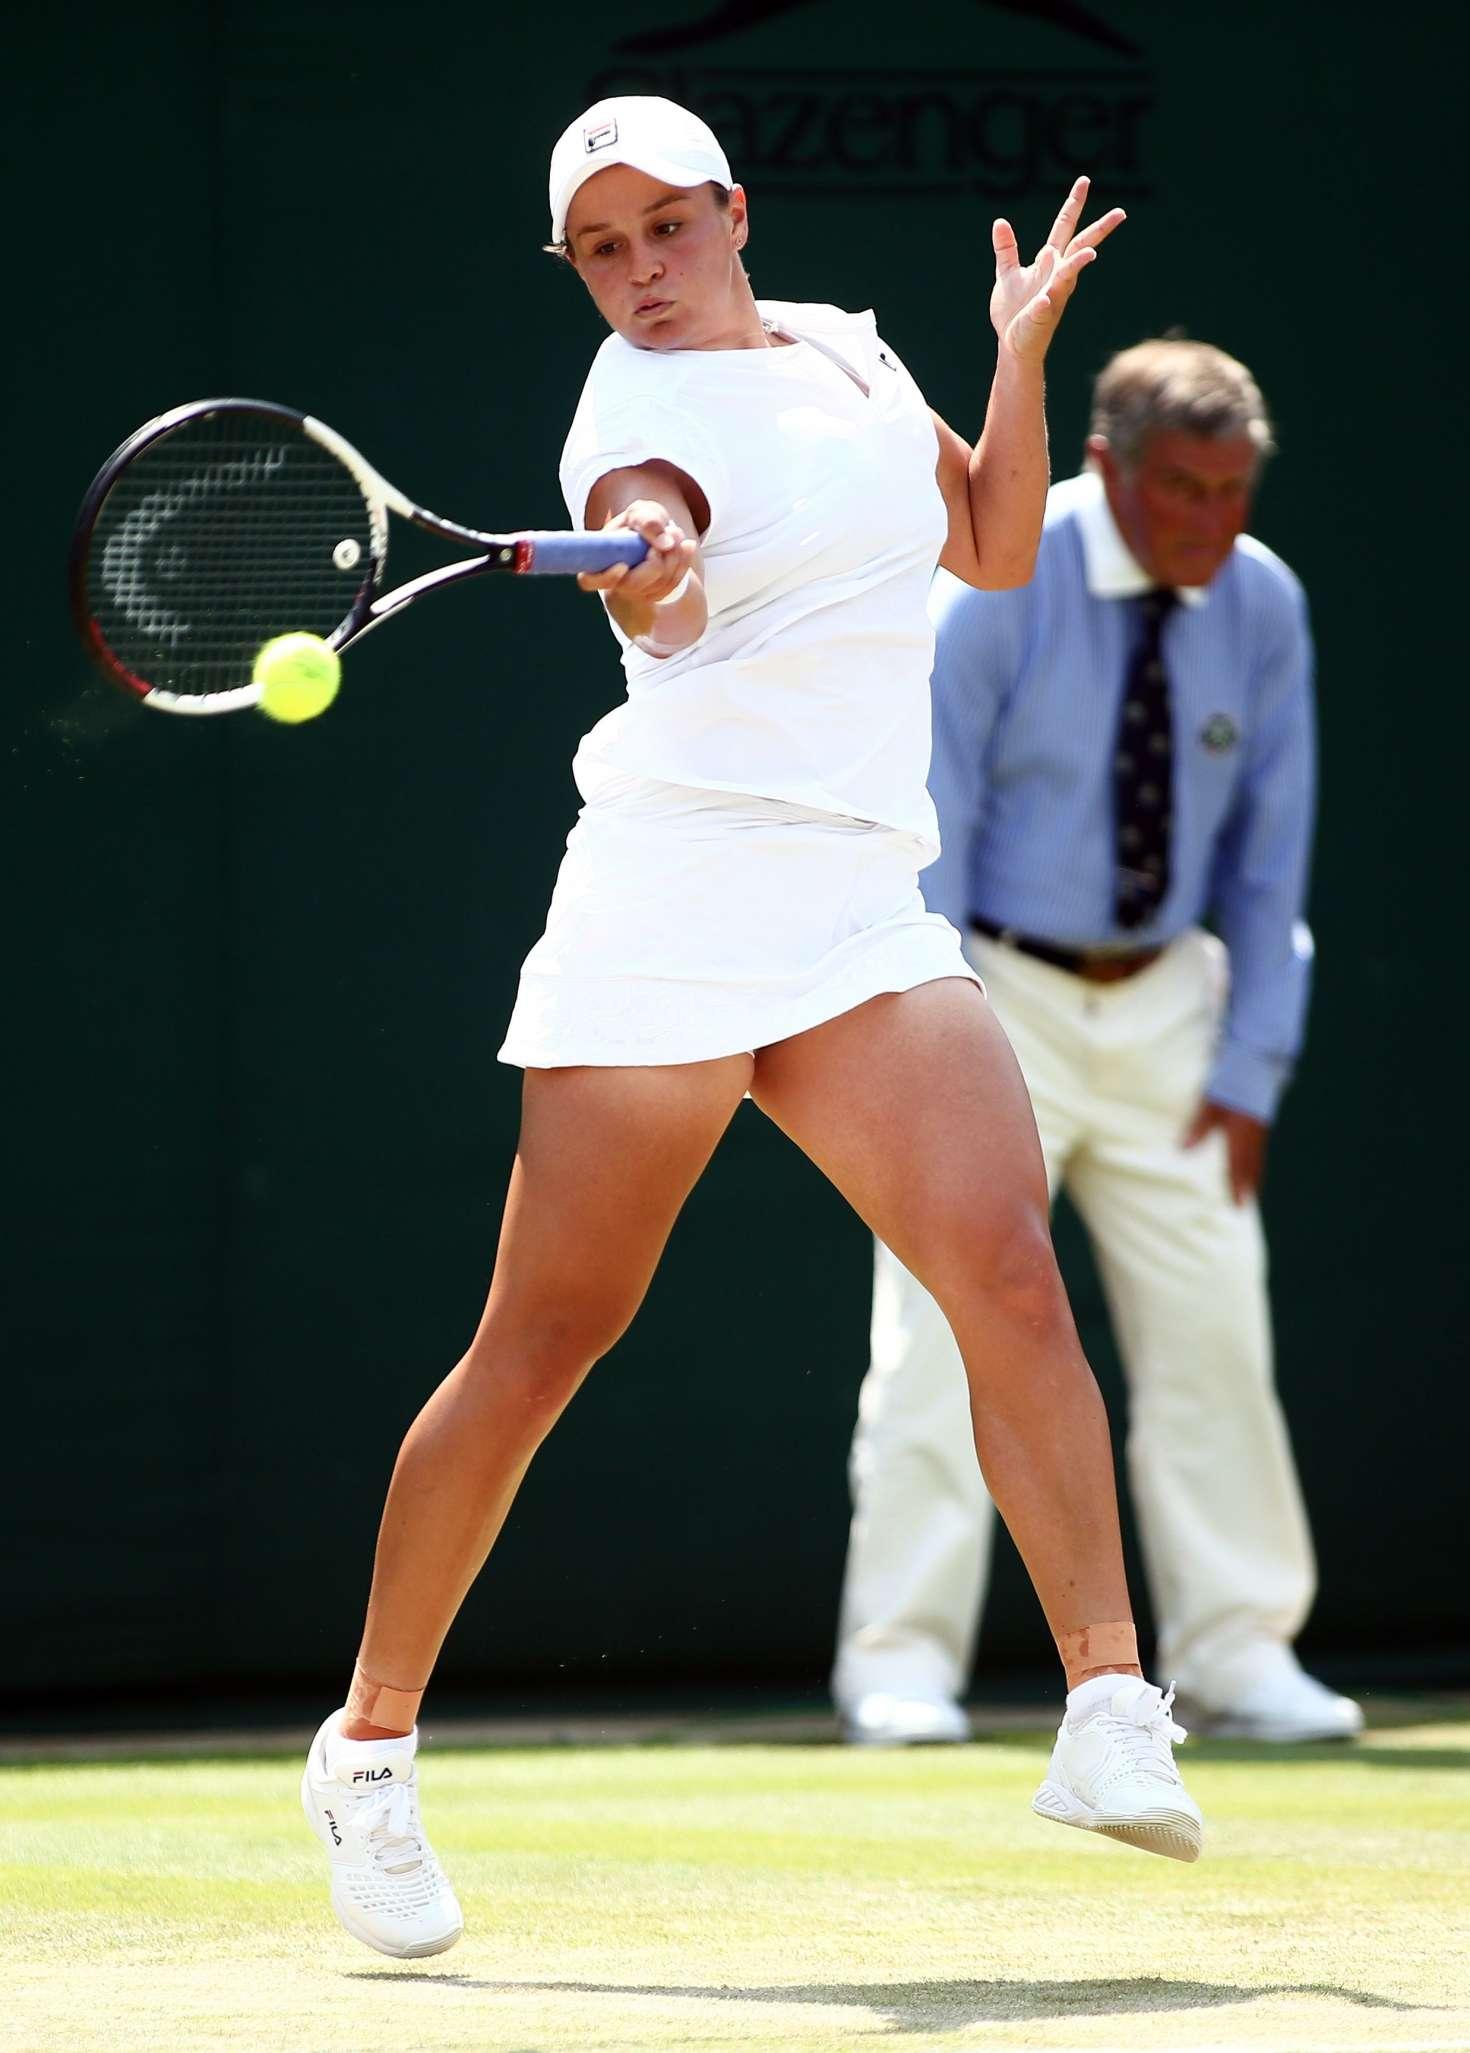 Ashleigh Barty - 2018 Wimbledon Tennis Championships in London Day 6